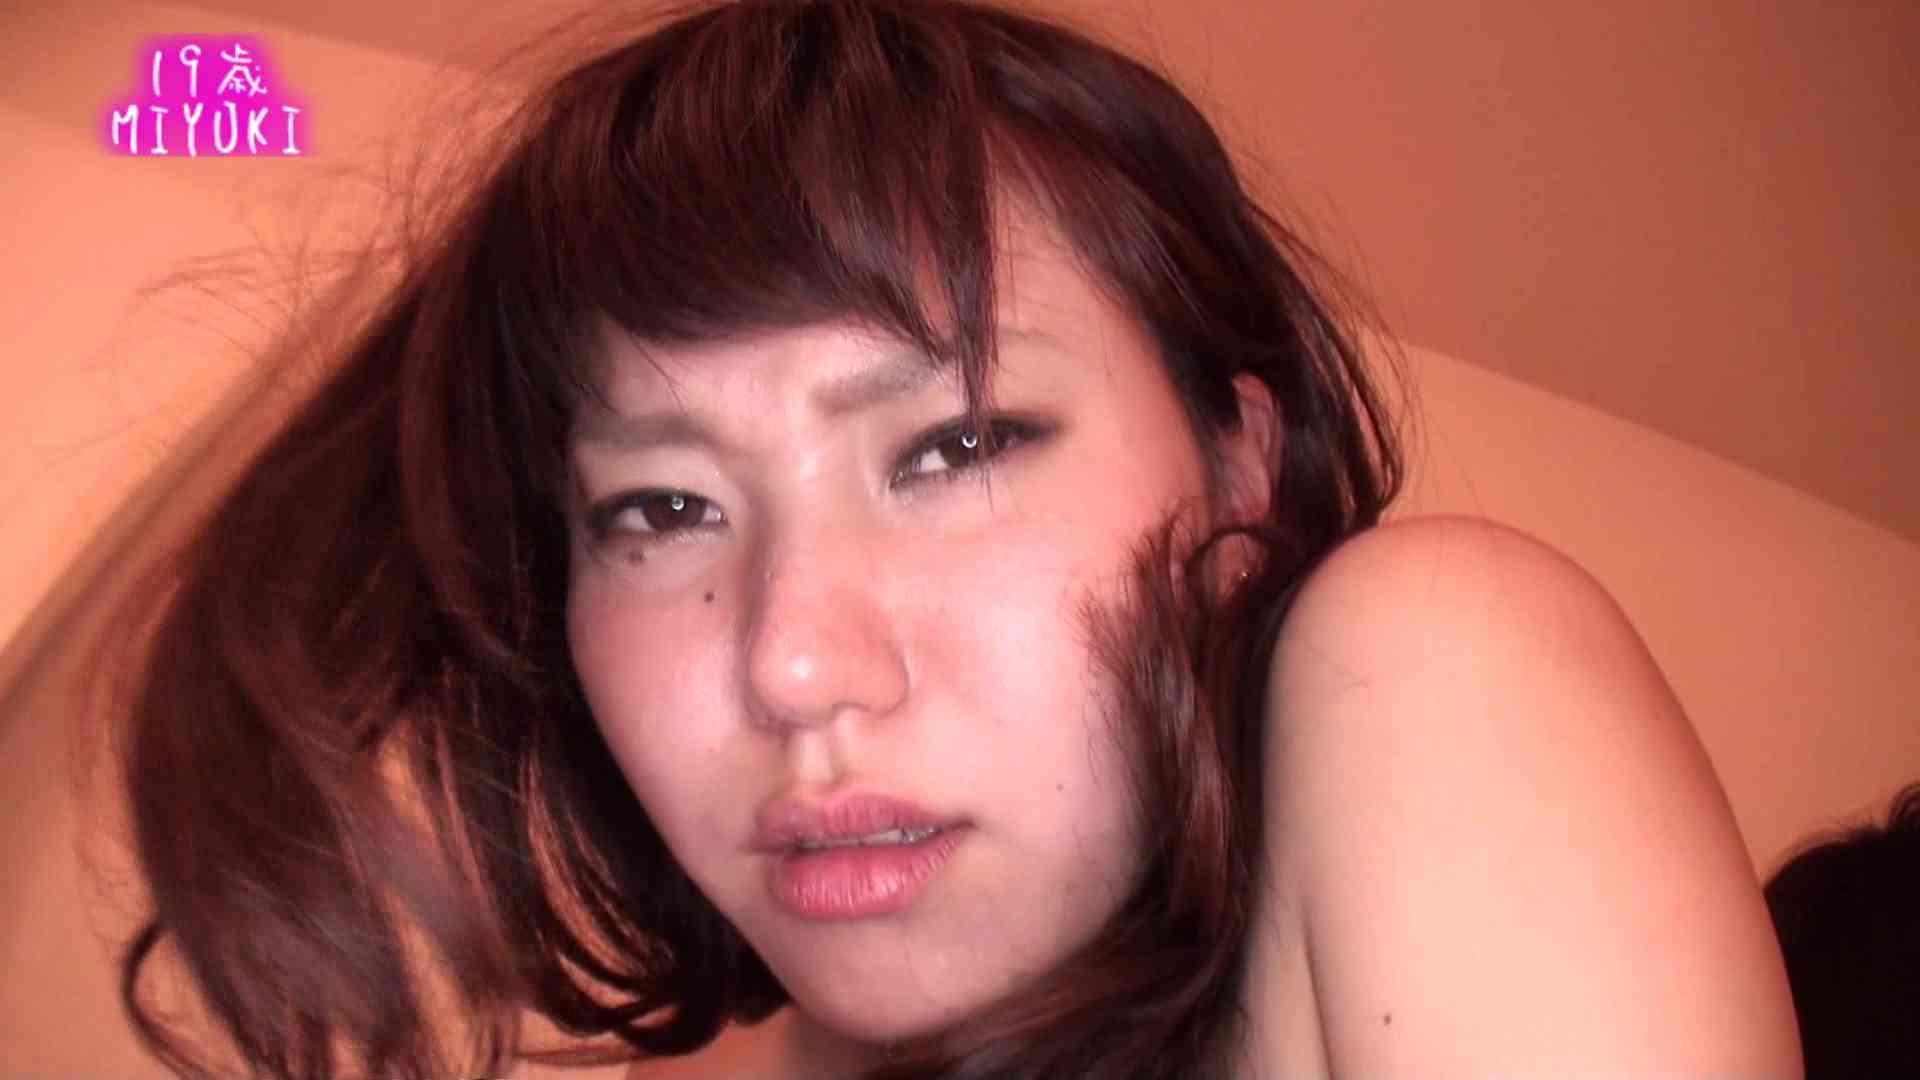 MIYUKIちゃん生挿入もう後戻りできません。 素人 | メーカー直接買い取り  104pic 1